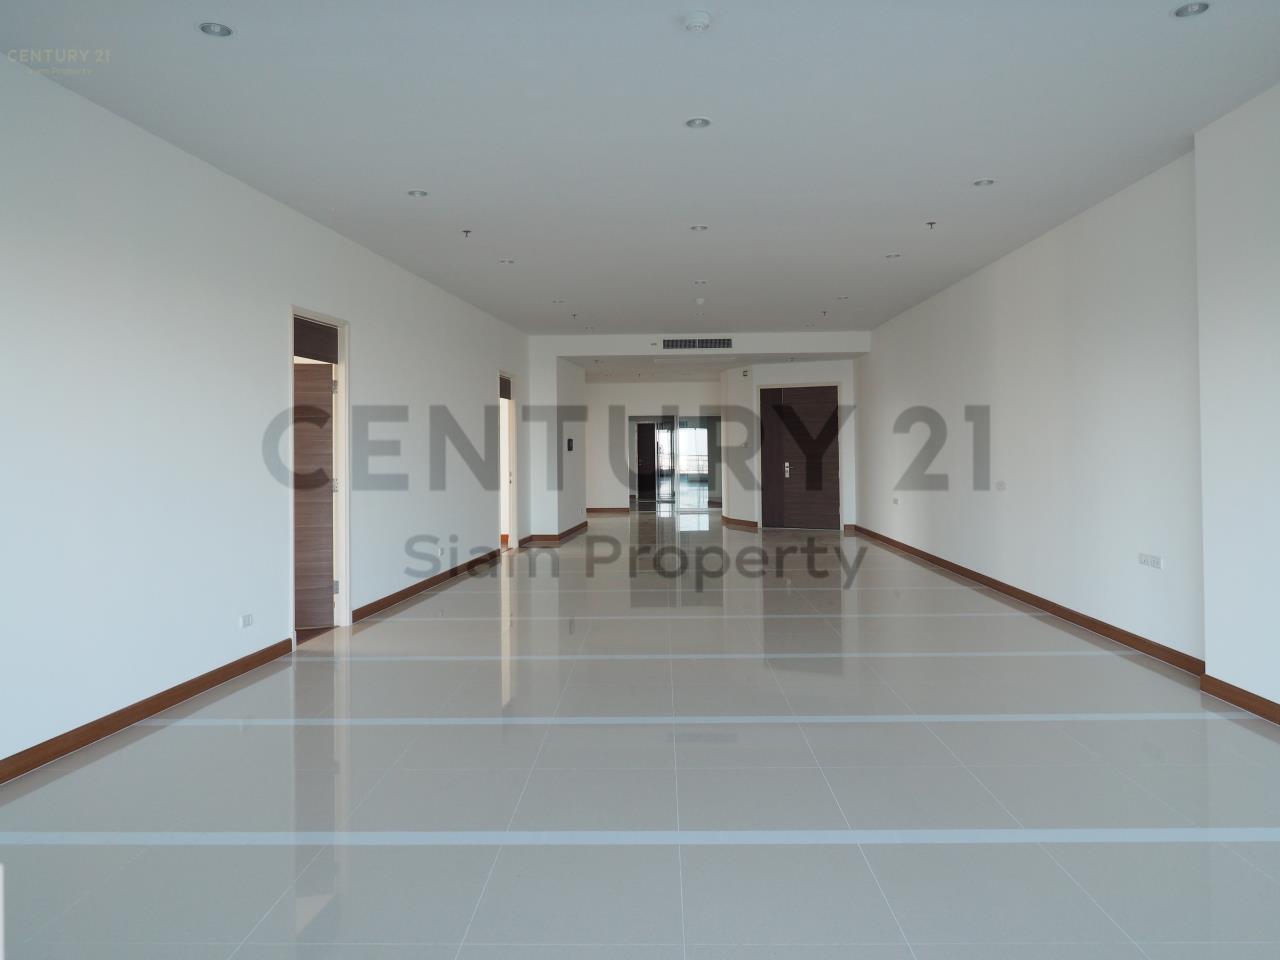 Century21 Siam Property Agency's Supalai Prima Riva 3